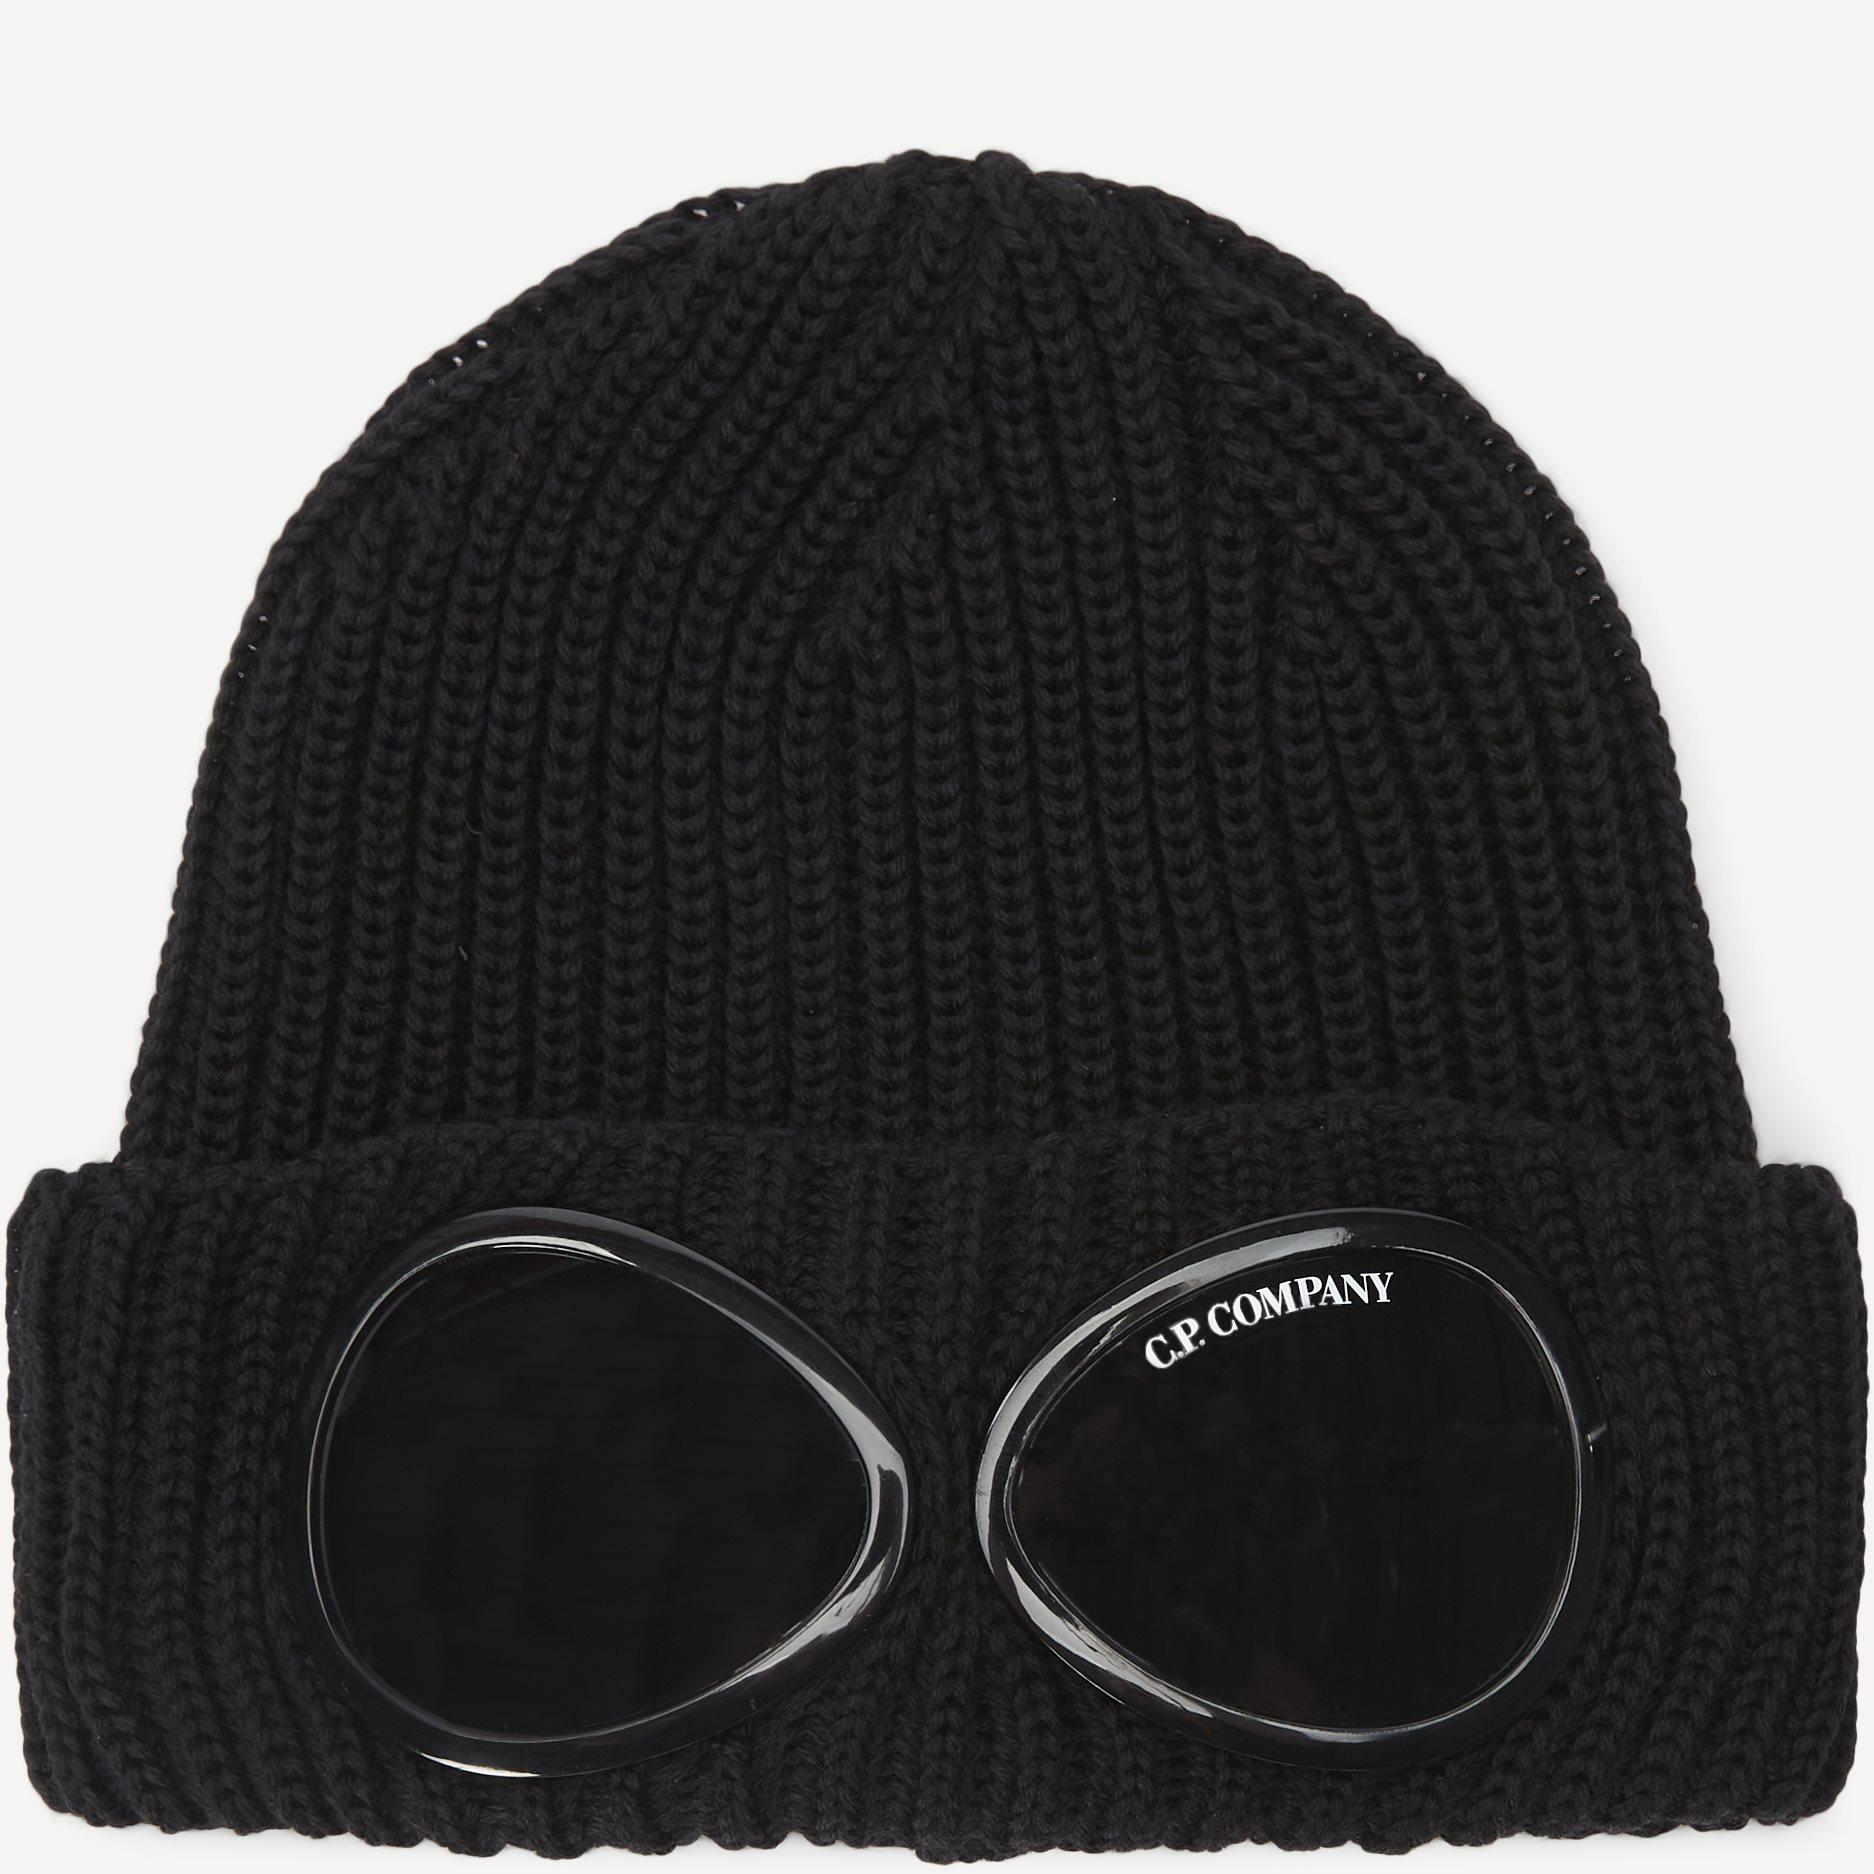 Goggle Beanie - Caps - Sort